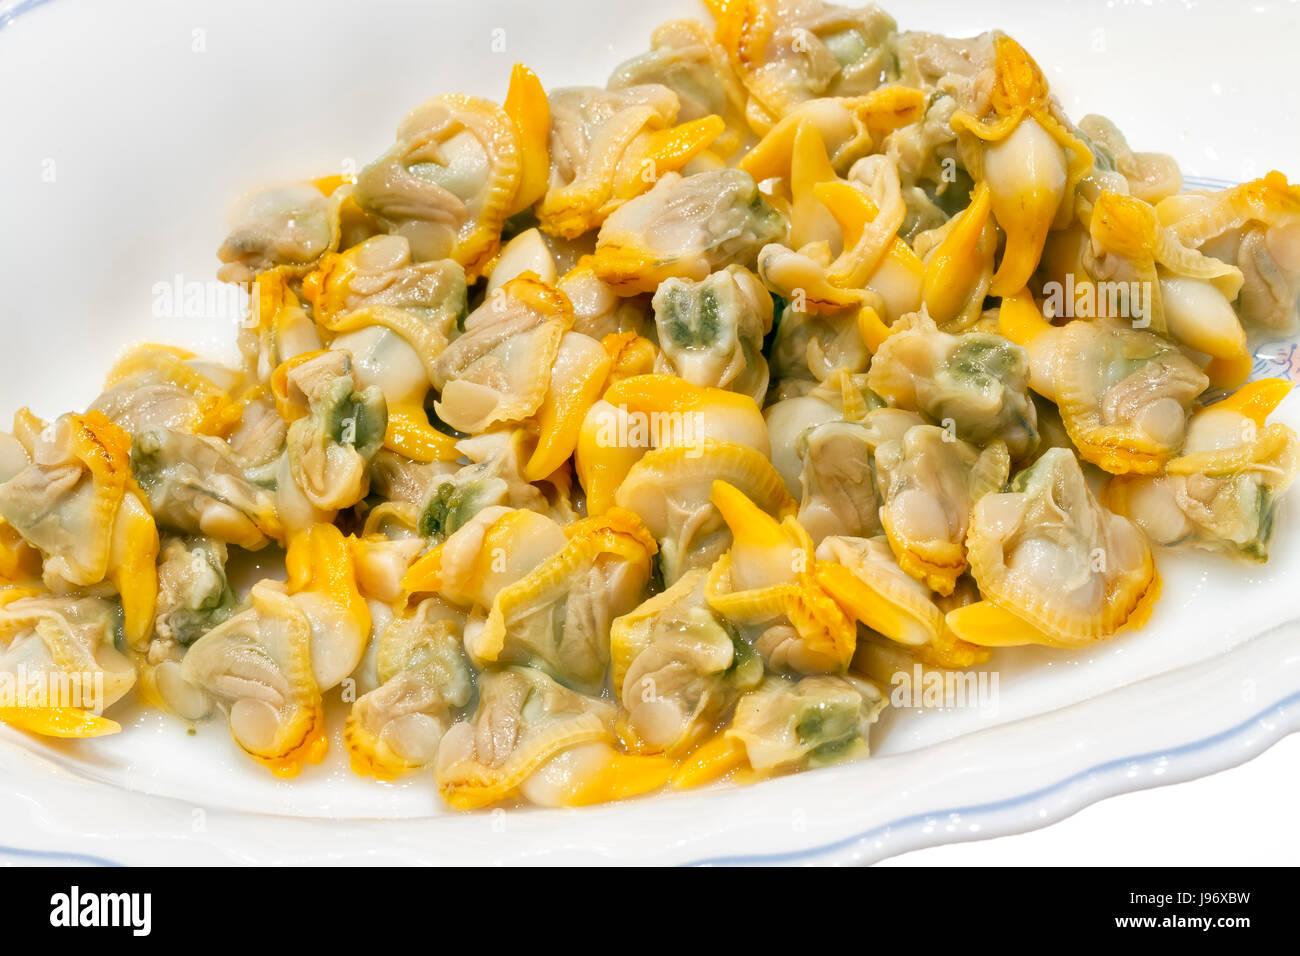 Comida, alimento, moluscos, conchas, mariscos crudos, comestibles, marina, marina, español Foto de stock